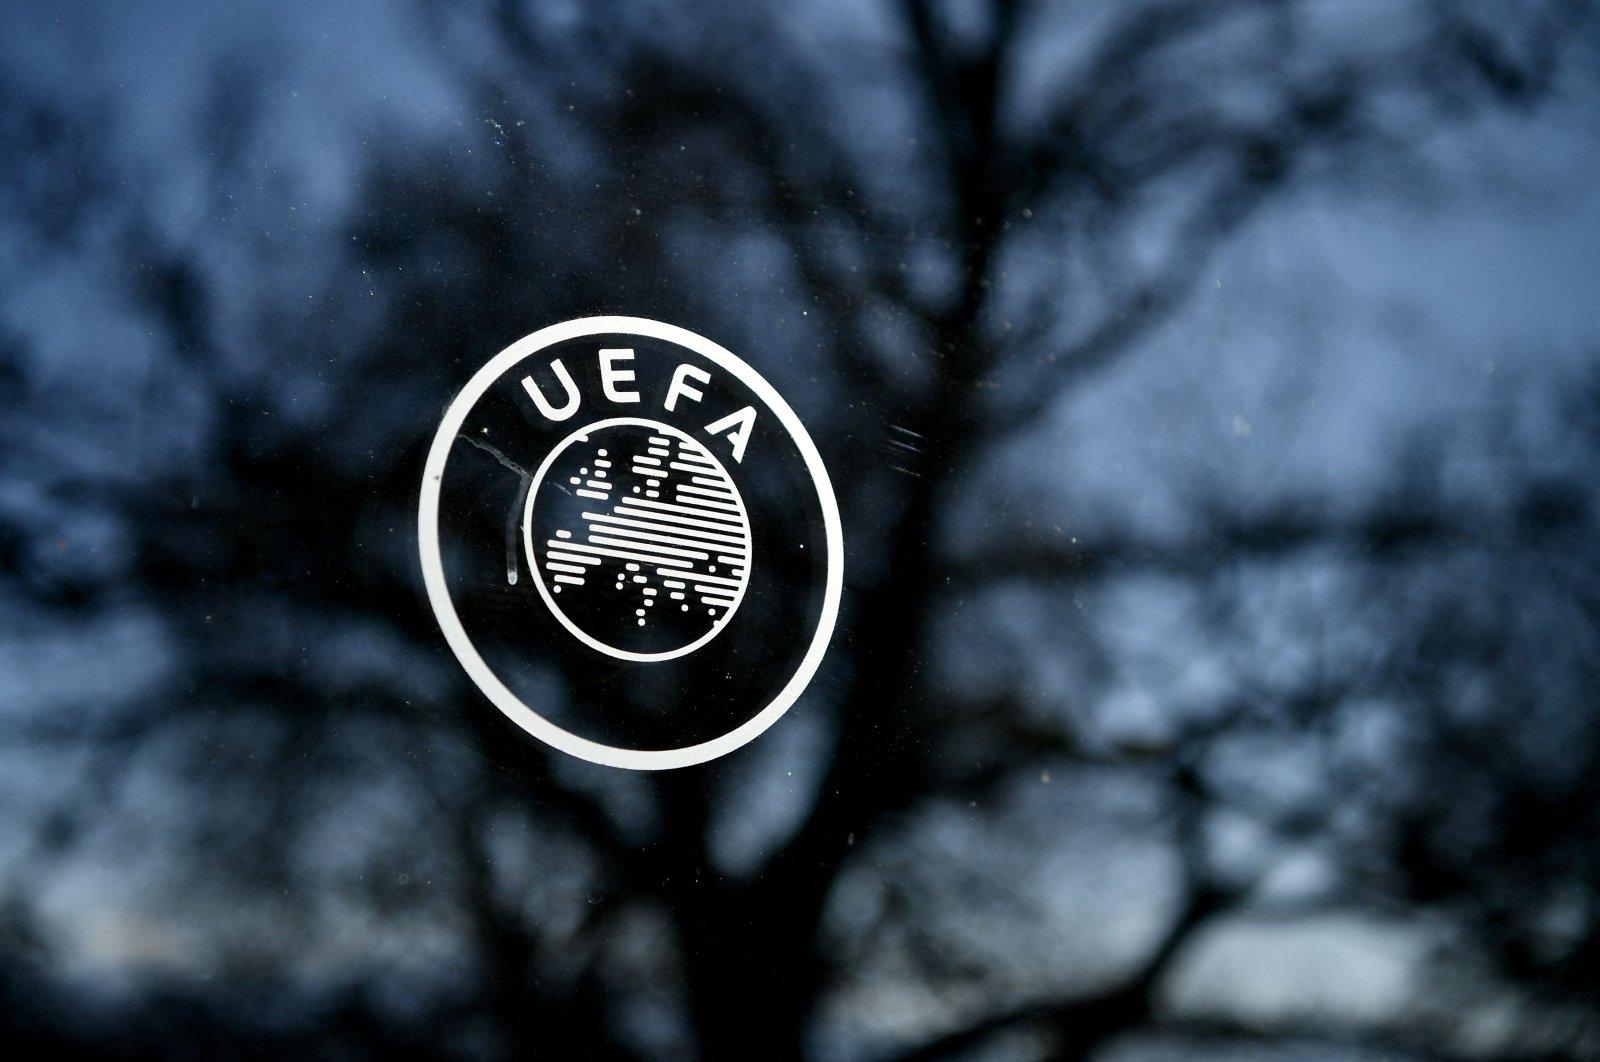 The UEFA logo at the organization's headquarters in Nyon, Switzerland, Feb. 28, 2020.